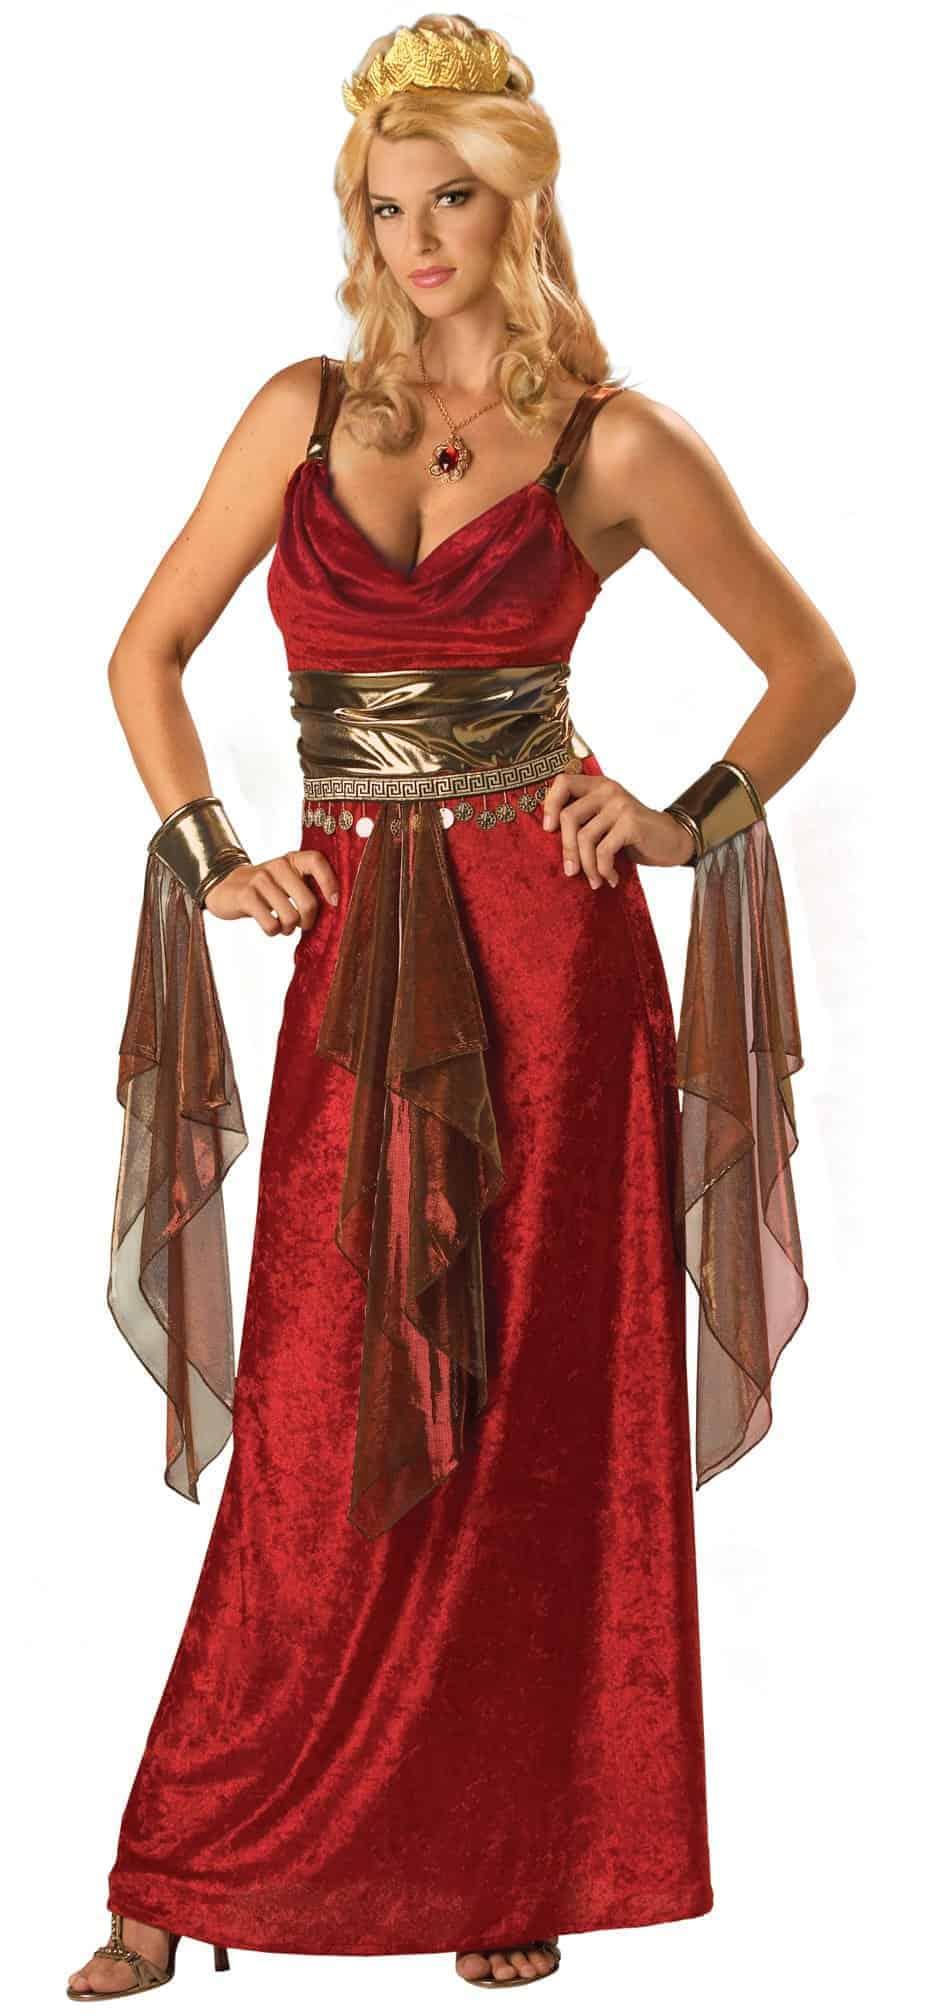 Glamourous Goddess Costume